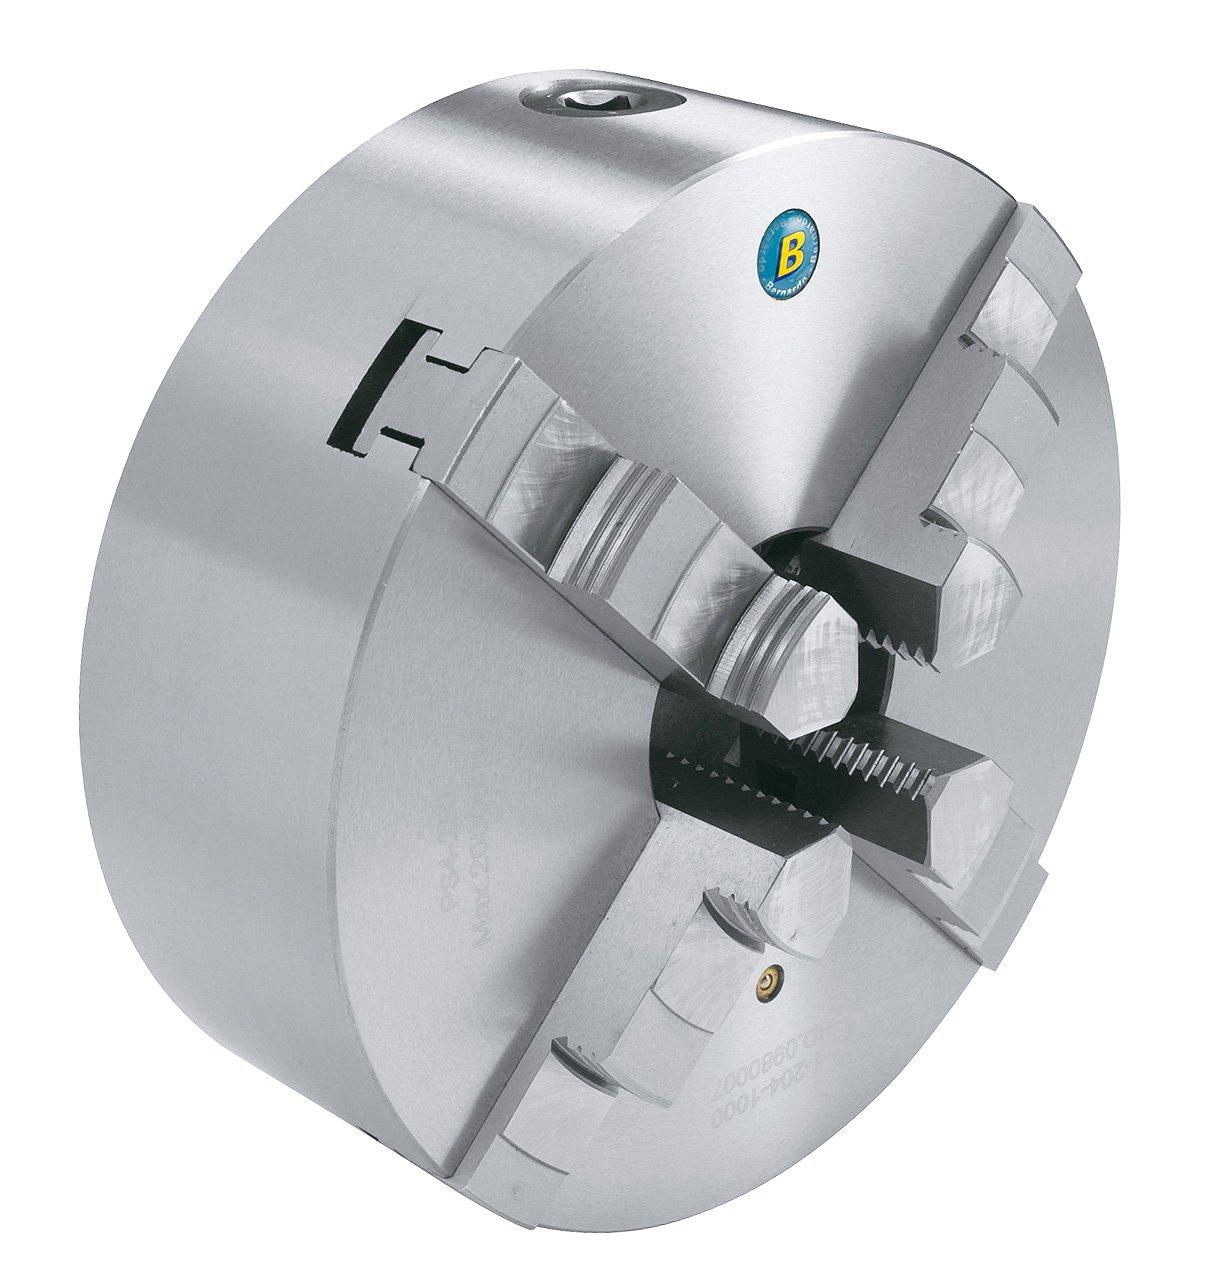 4 bakket centrerpatron standard DK12-80